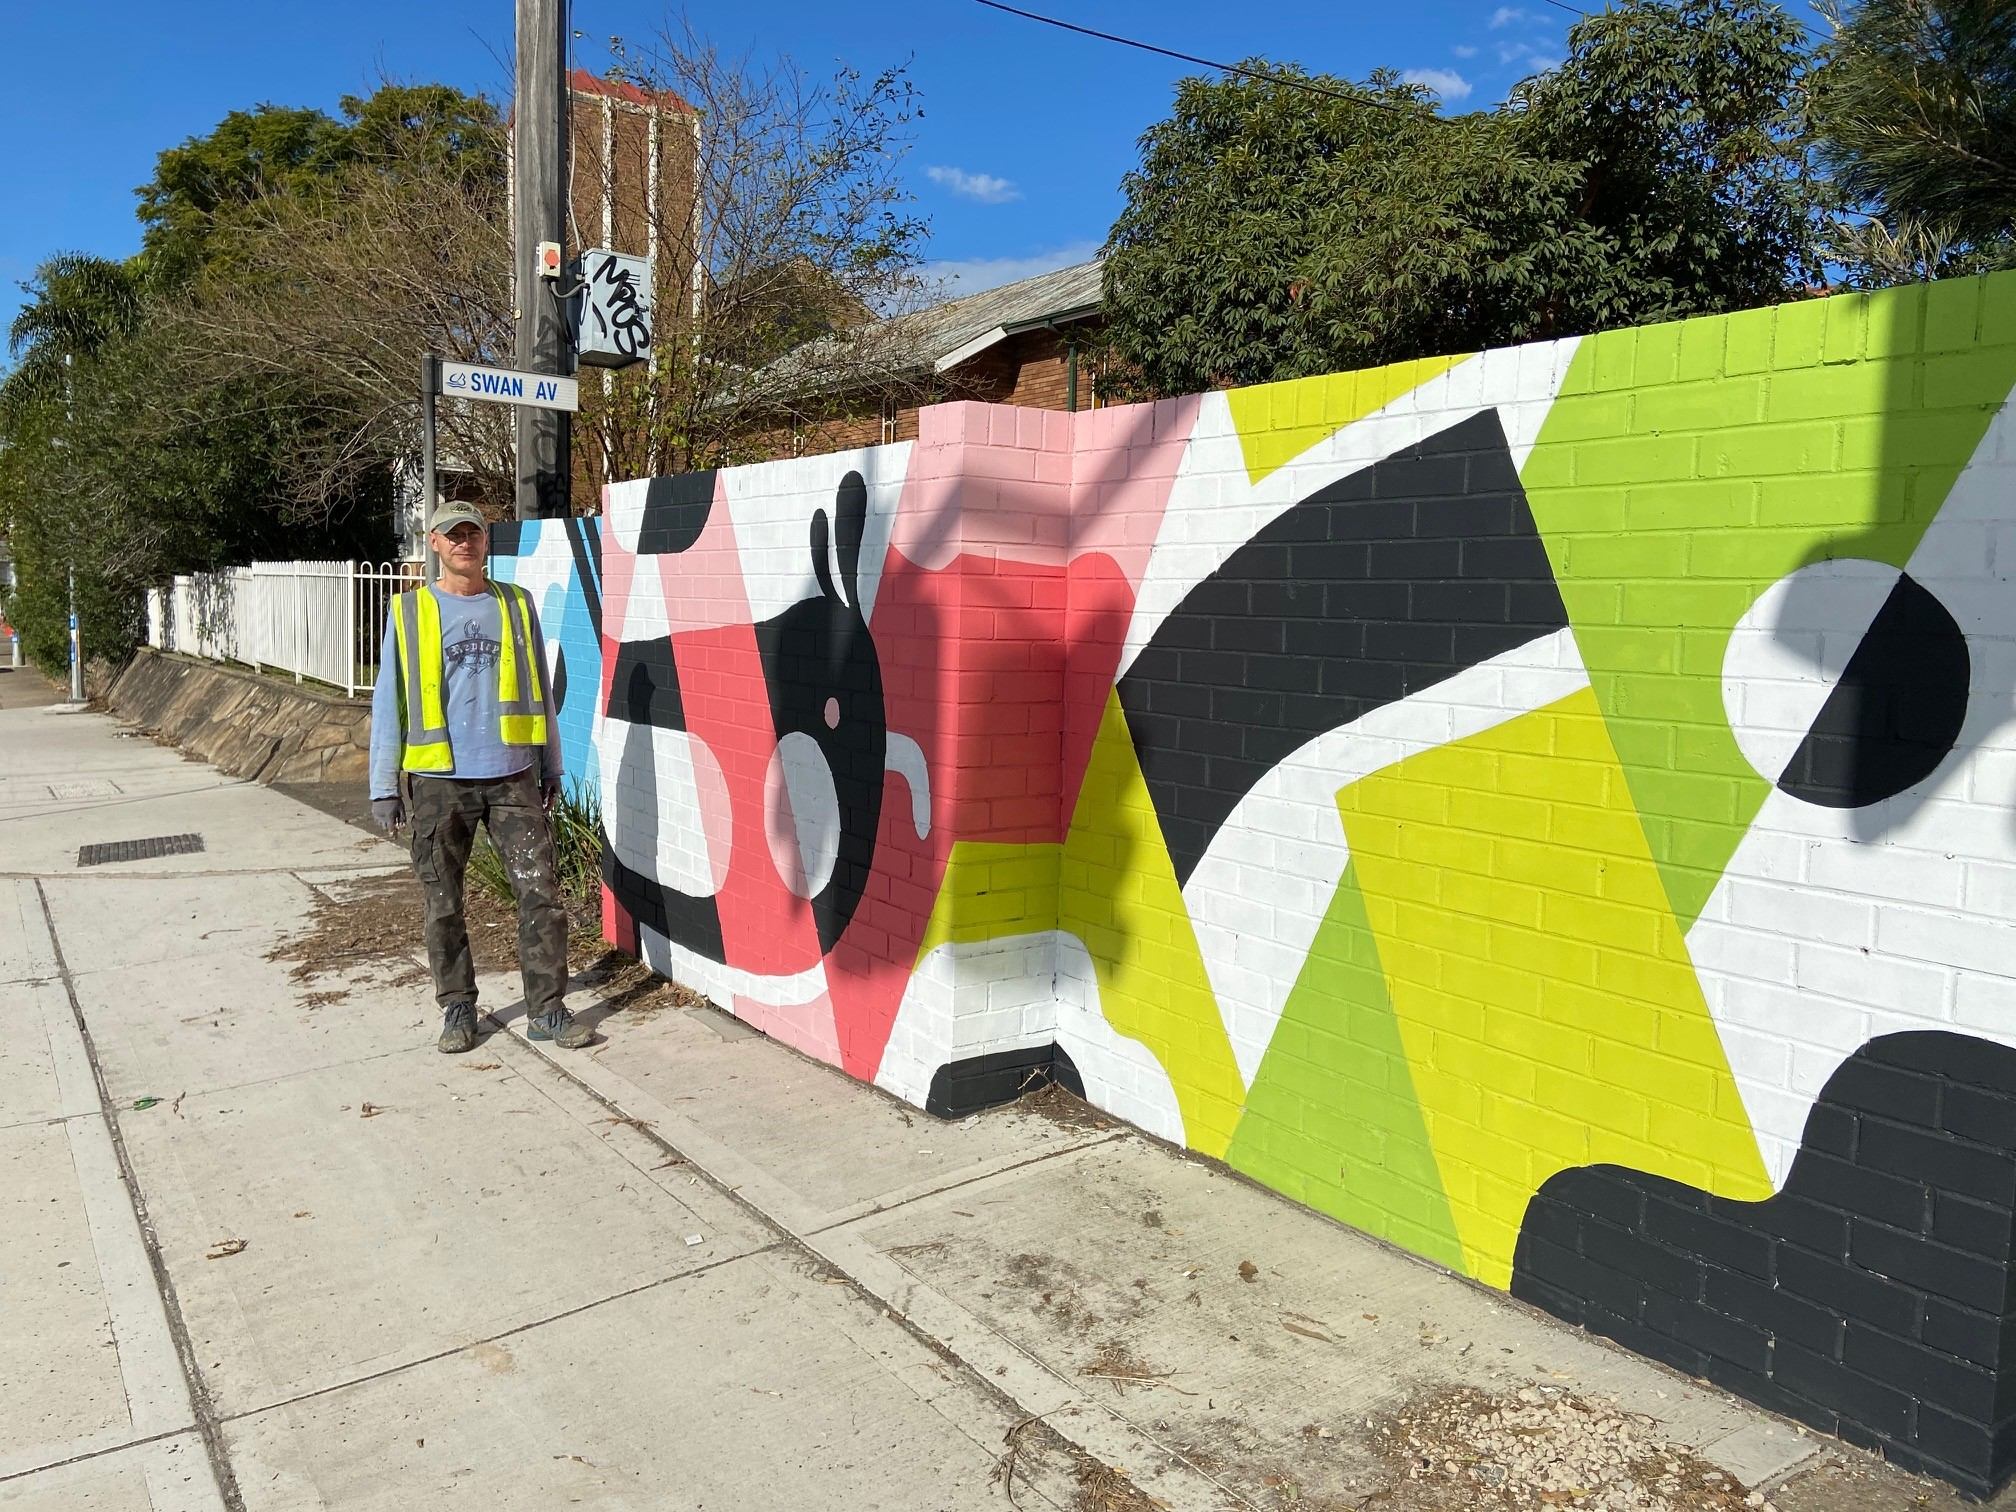 Finished Mural with artist Ignacio Querejeta